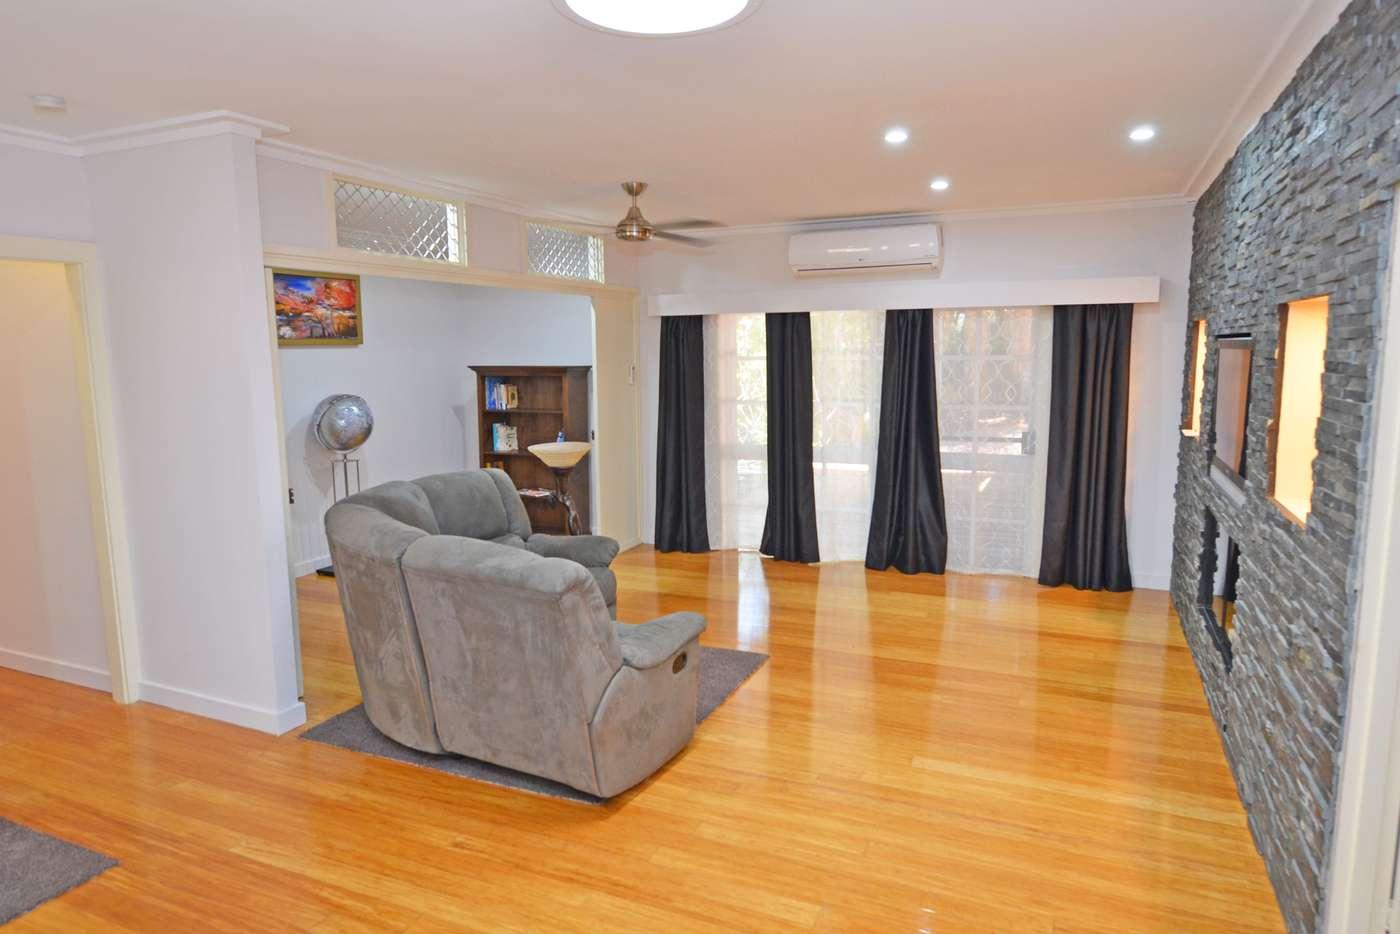 Sixth view of Homely house listing, 10 Robins Street, Mareeba QLD 4880